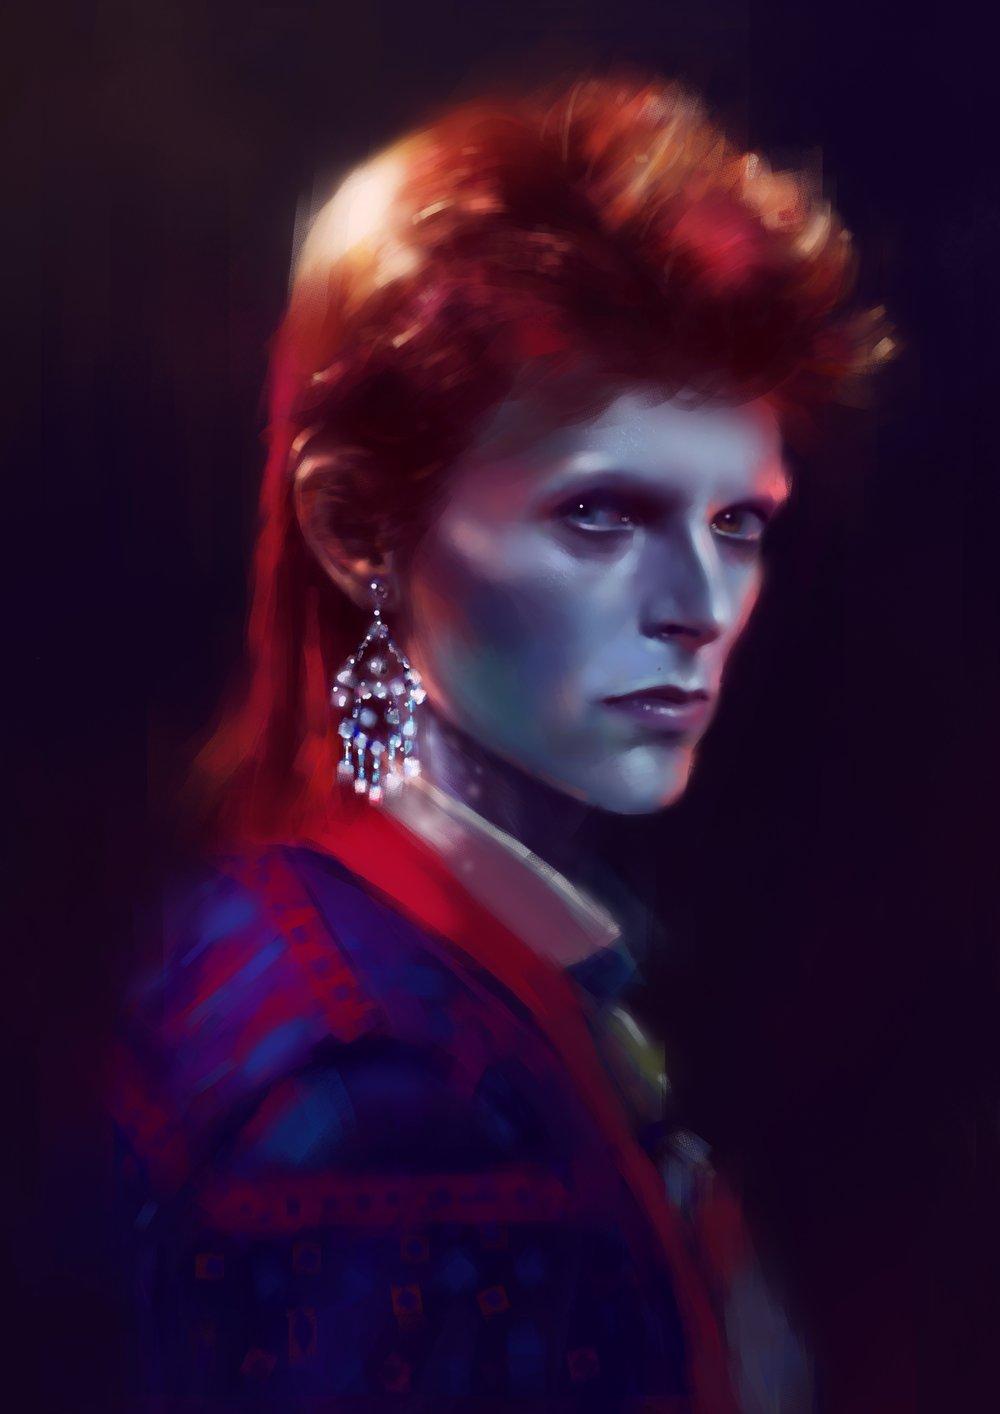 Eftristesse- Bowie Inspired Art Print Collaboration (Set of 3)